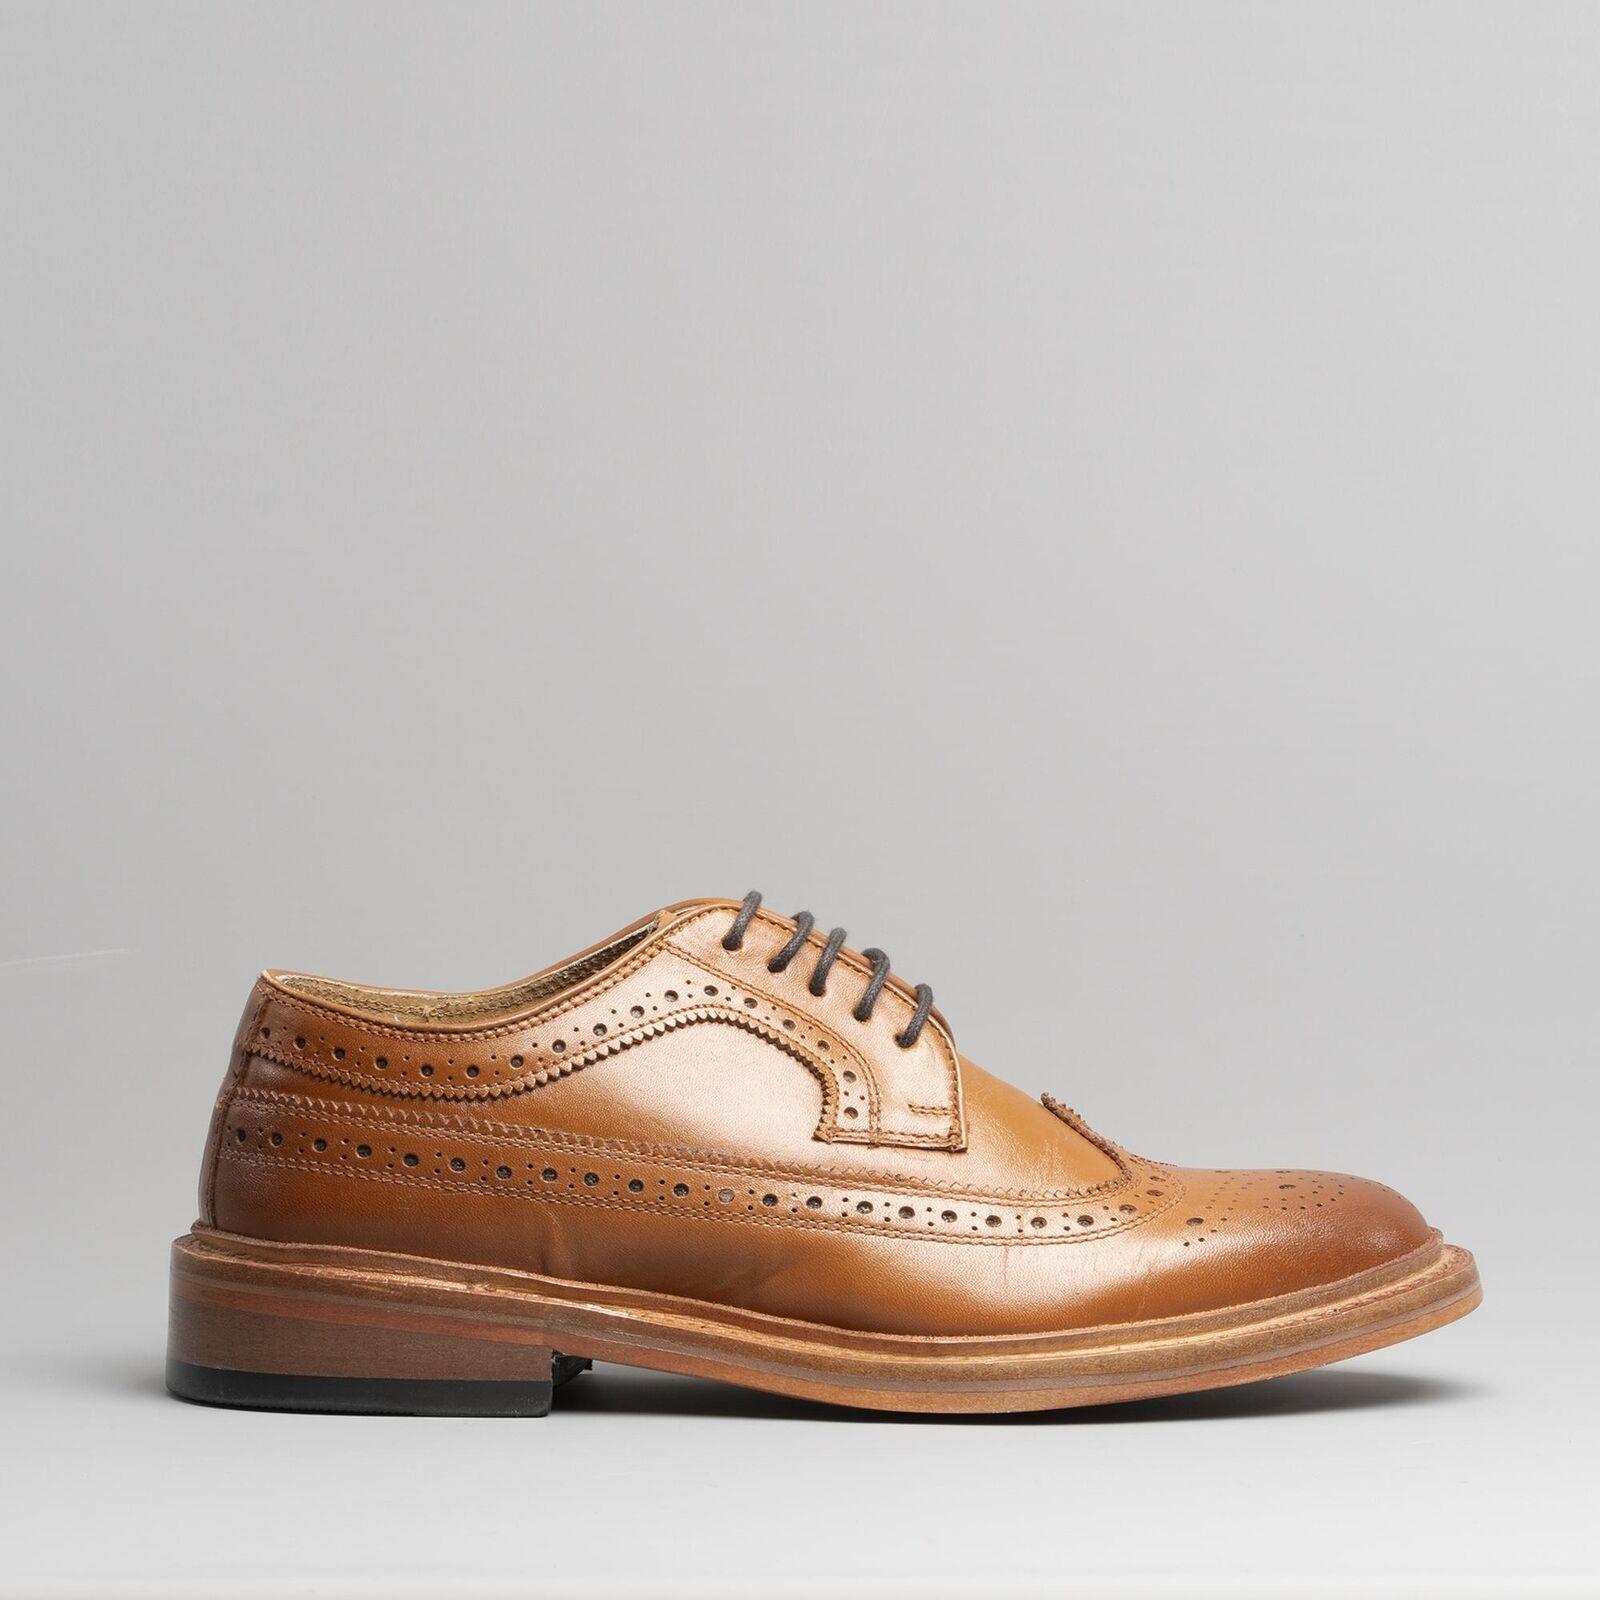 Kensington LUIS Mens Luxury Leather Formal Traditional Brogue Derby schuhe Tan